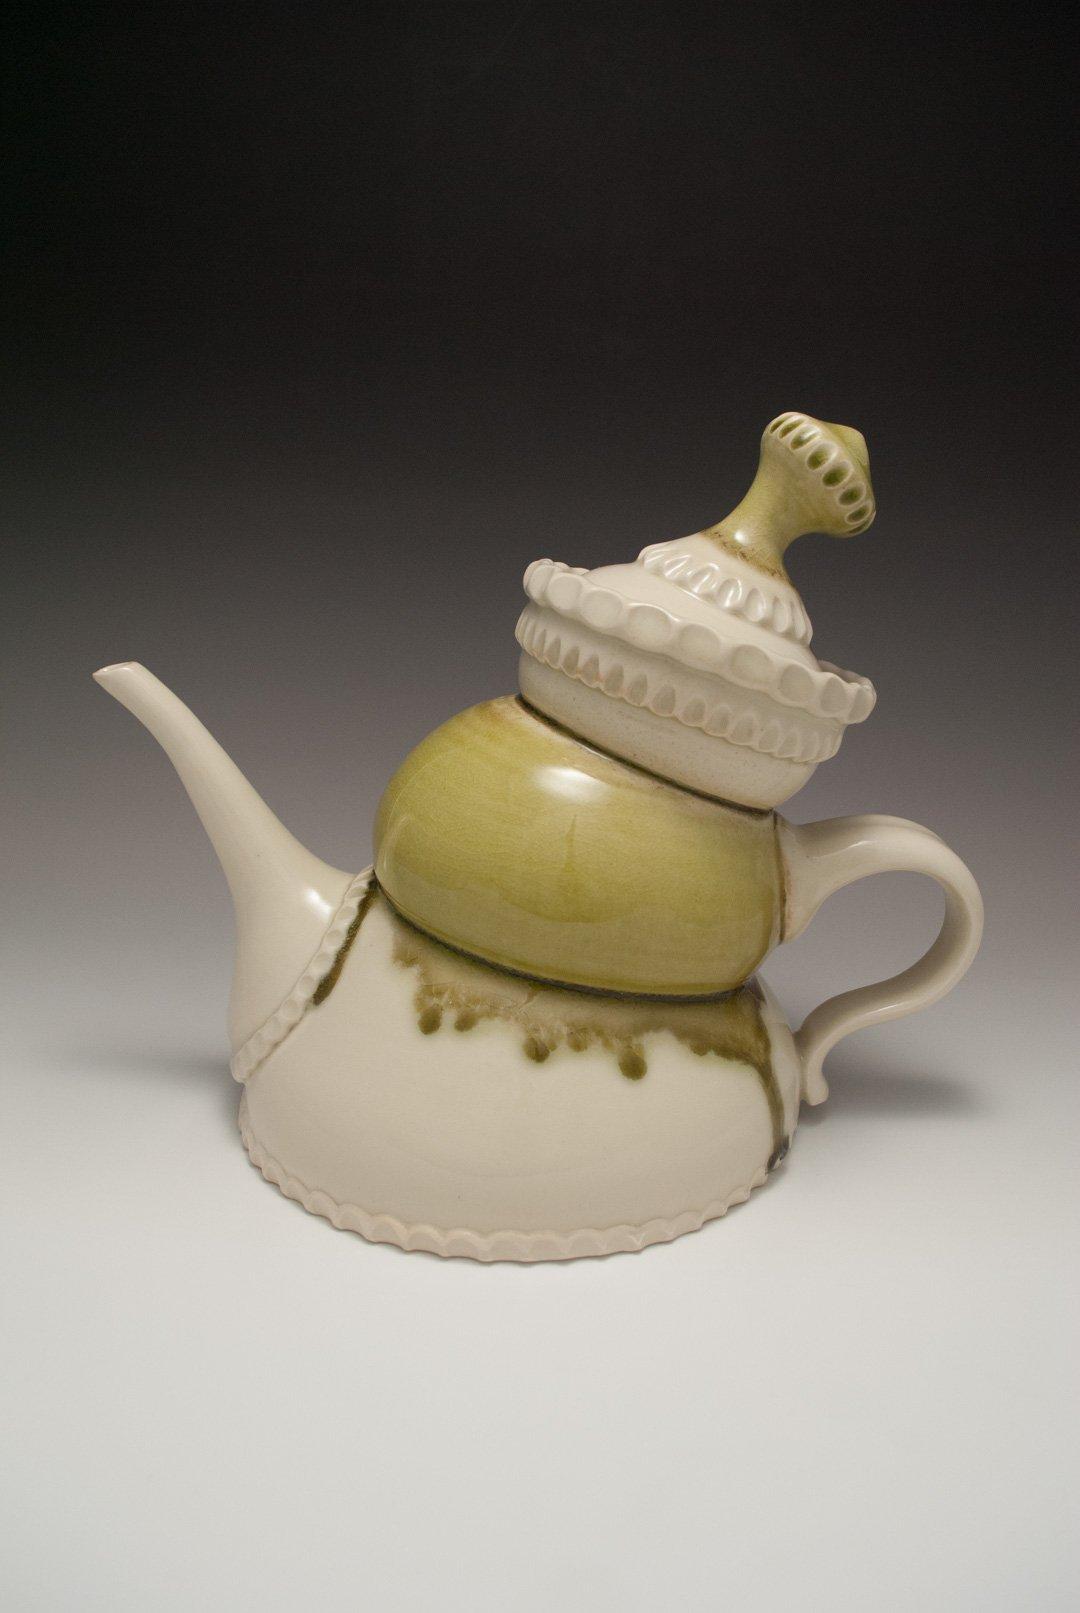 suemcleodceramics-1080w-teapots-2678